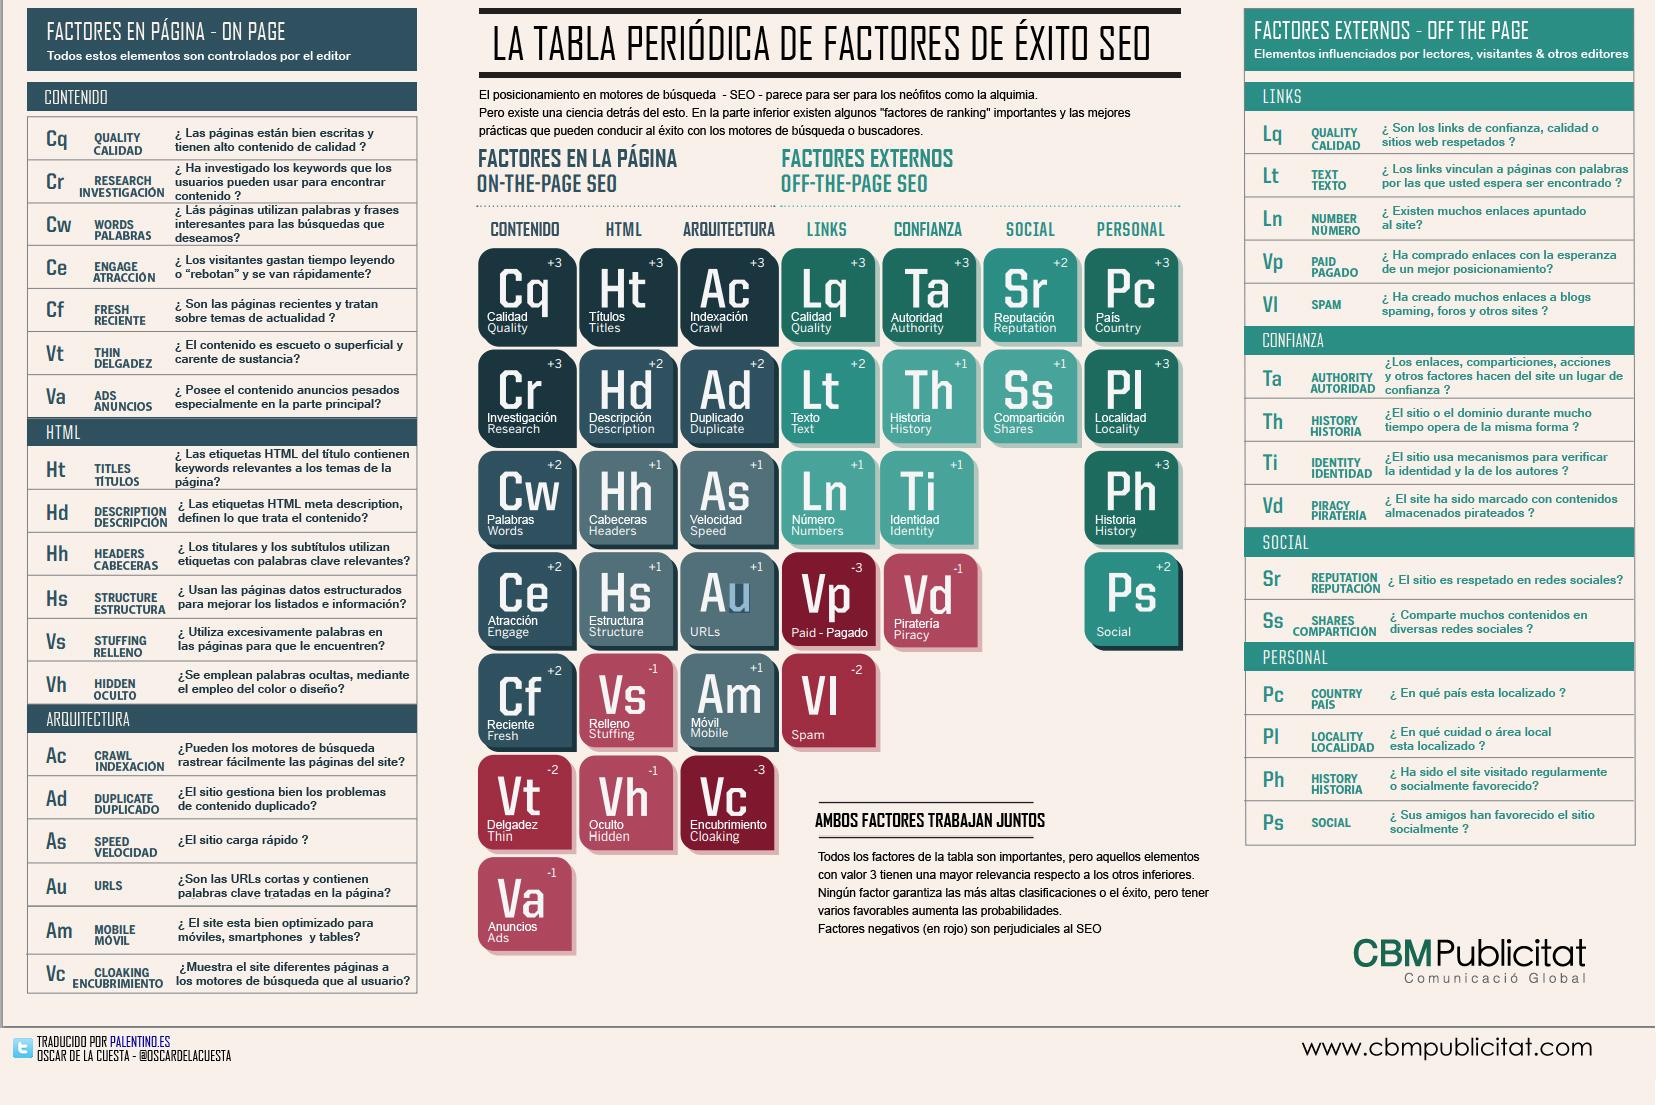 La-tabla-periodica-del-seo-cbm_publicitat